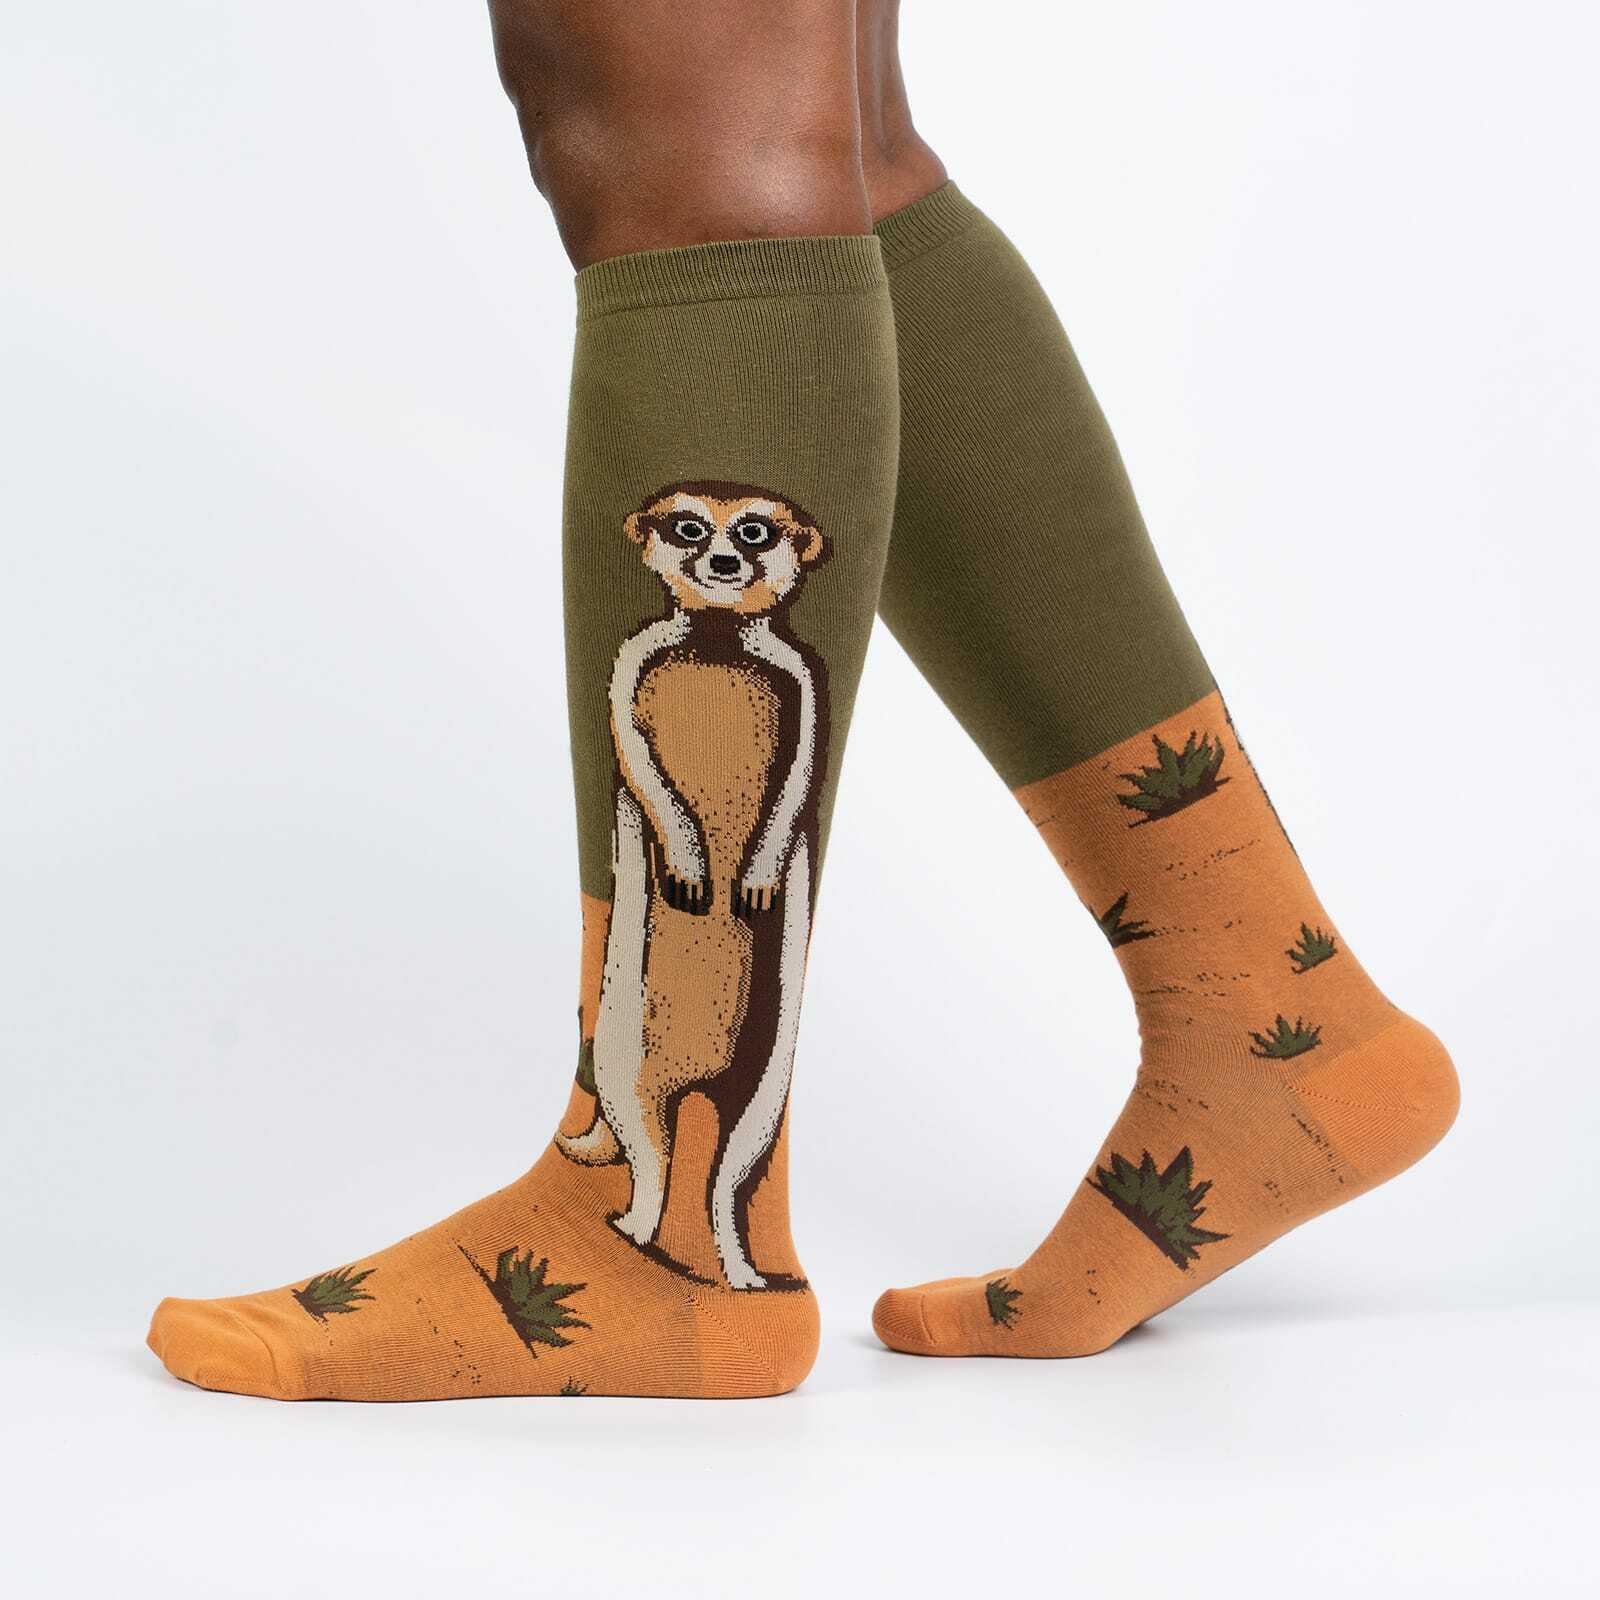 Meerkate Manner - Cute Funny Animal Knee High Socks Unisex - Men's and Women's in Orange